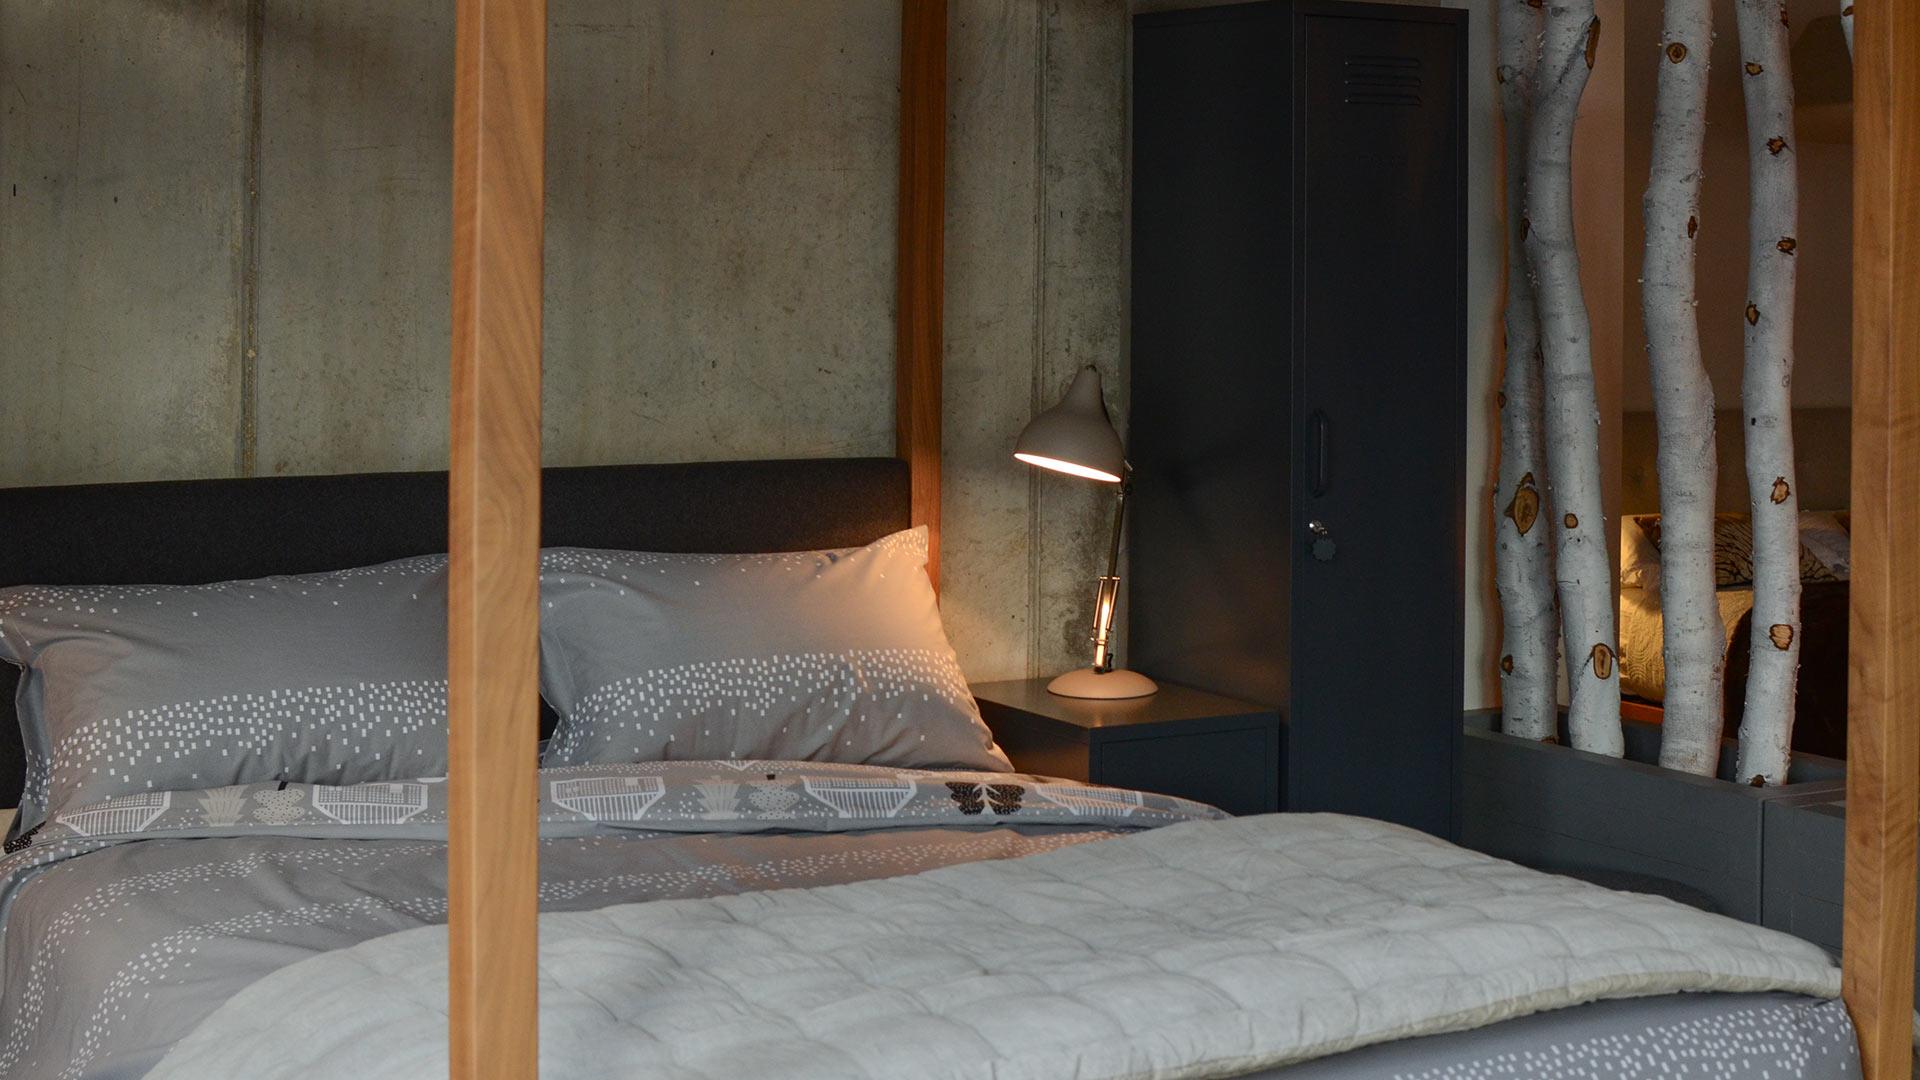 Donna Wilson Grey Duvet Set on the walnut Highland 4 poster wooden bed